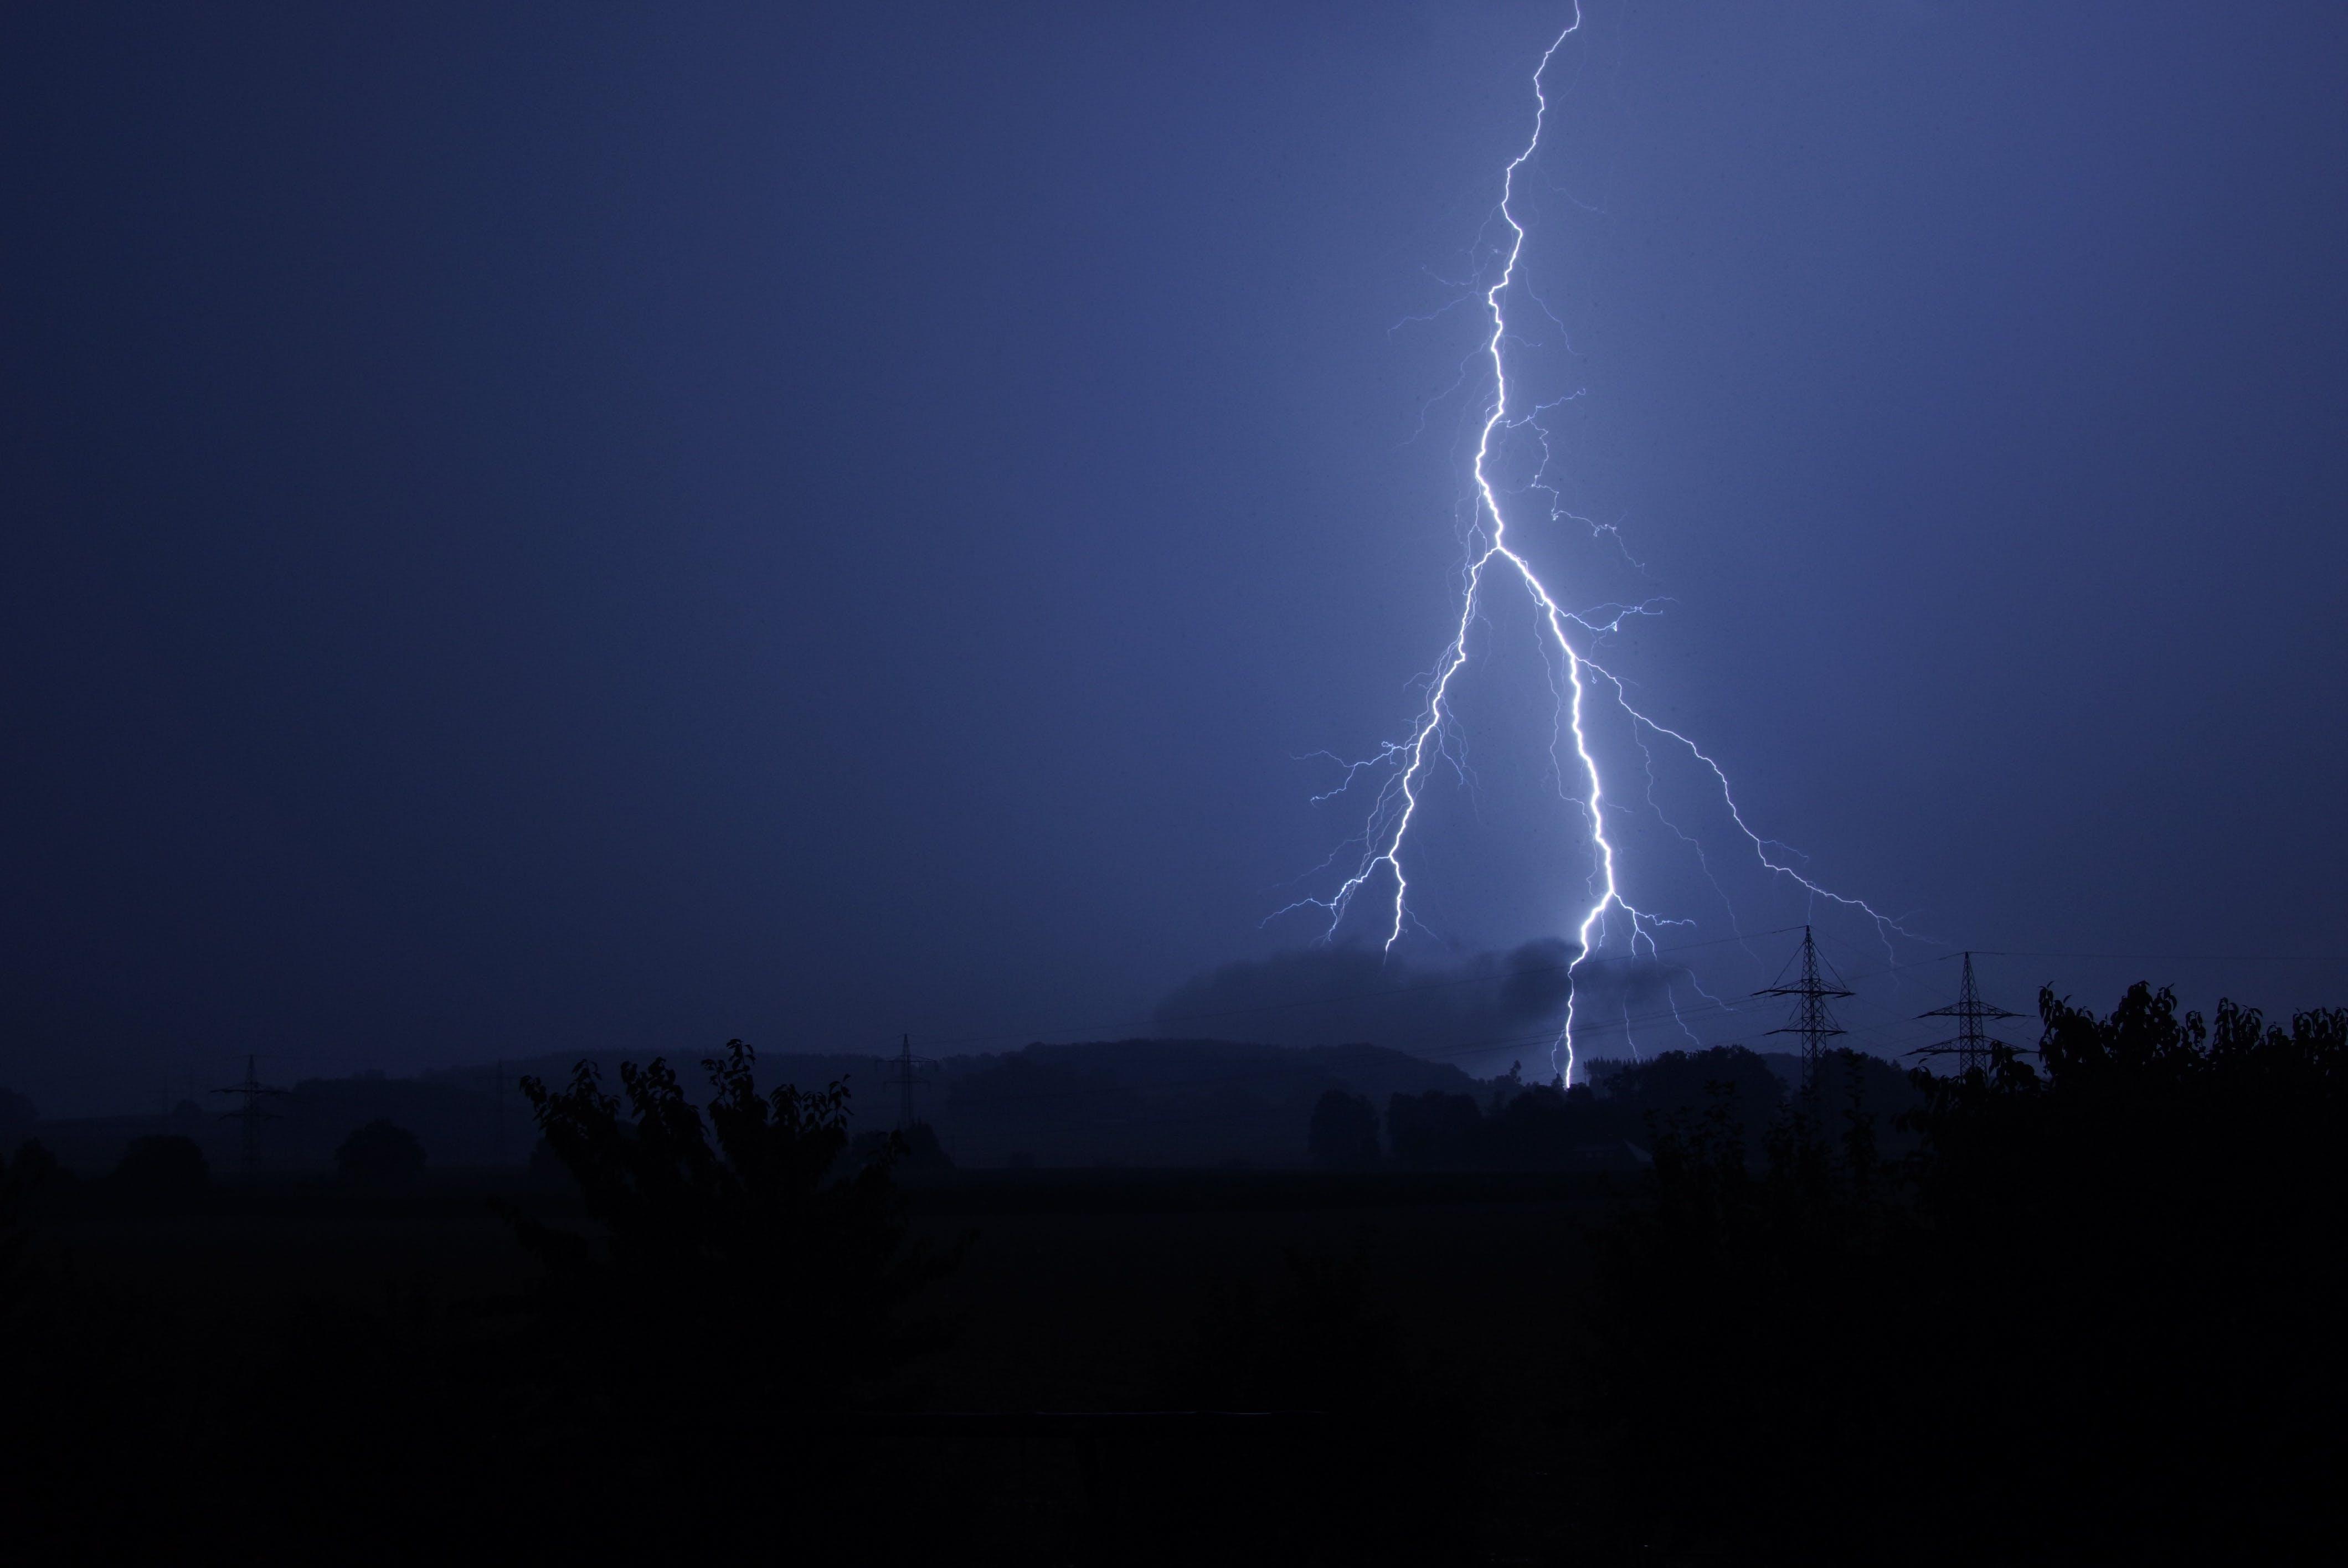 Lightning Jolt during Night Time